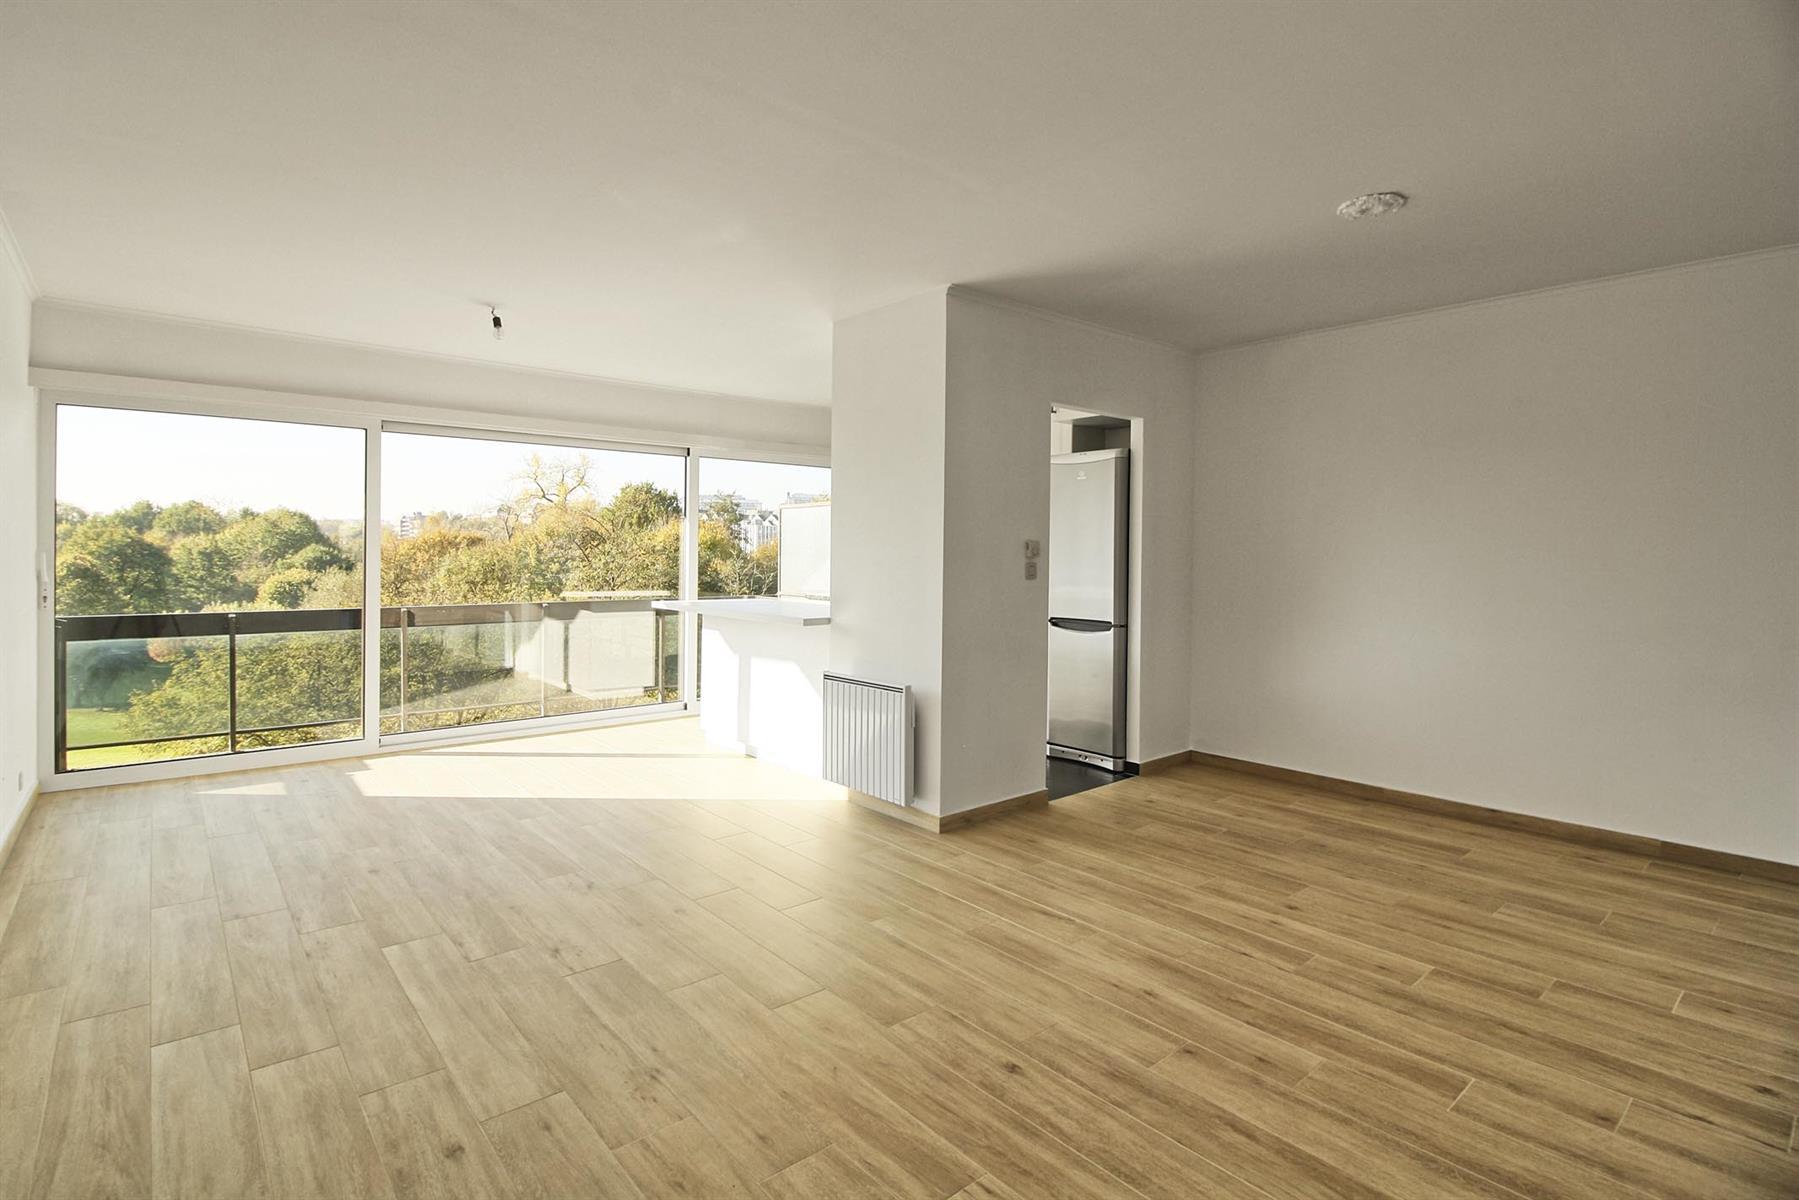 Appartement - Woluwe-Saint-Lambert - #4237926-0